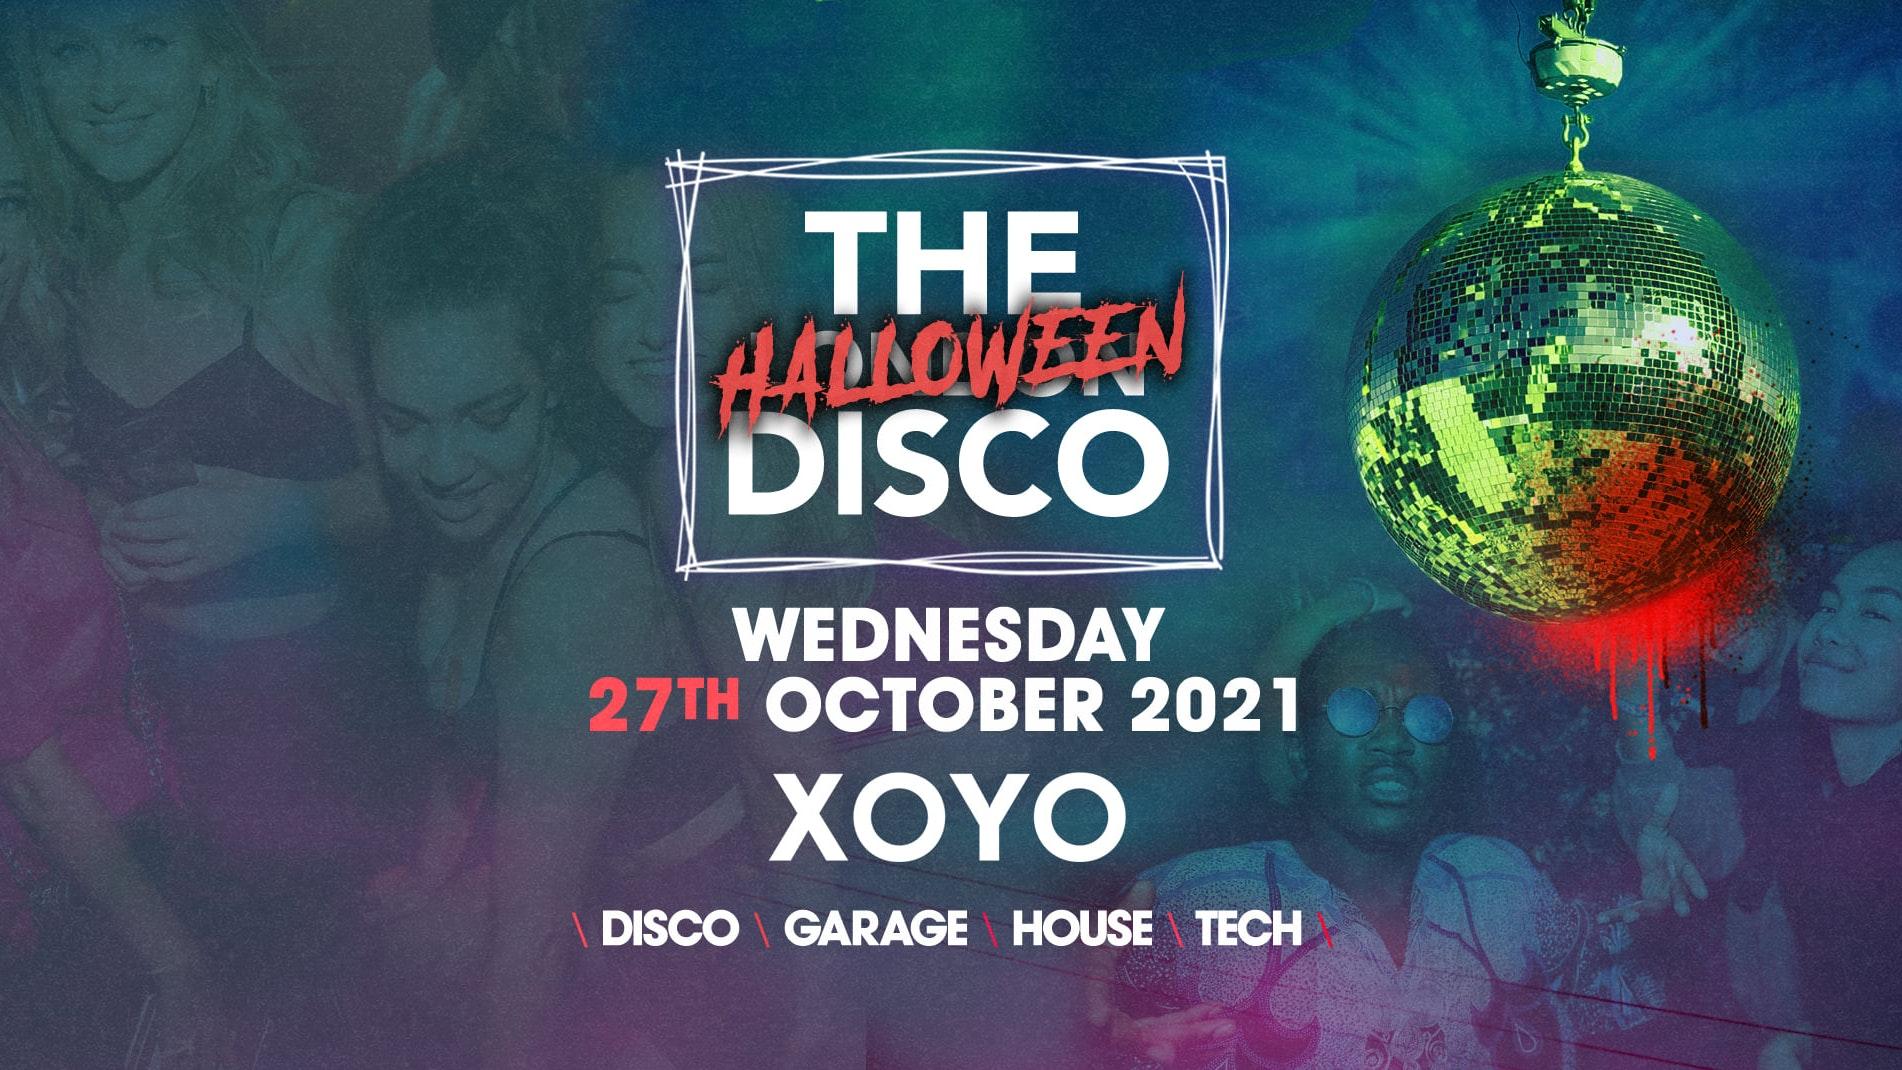 The London Halloween Disco 👽 House x Techno x Disco x Garage   XOYO